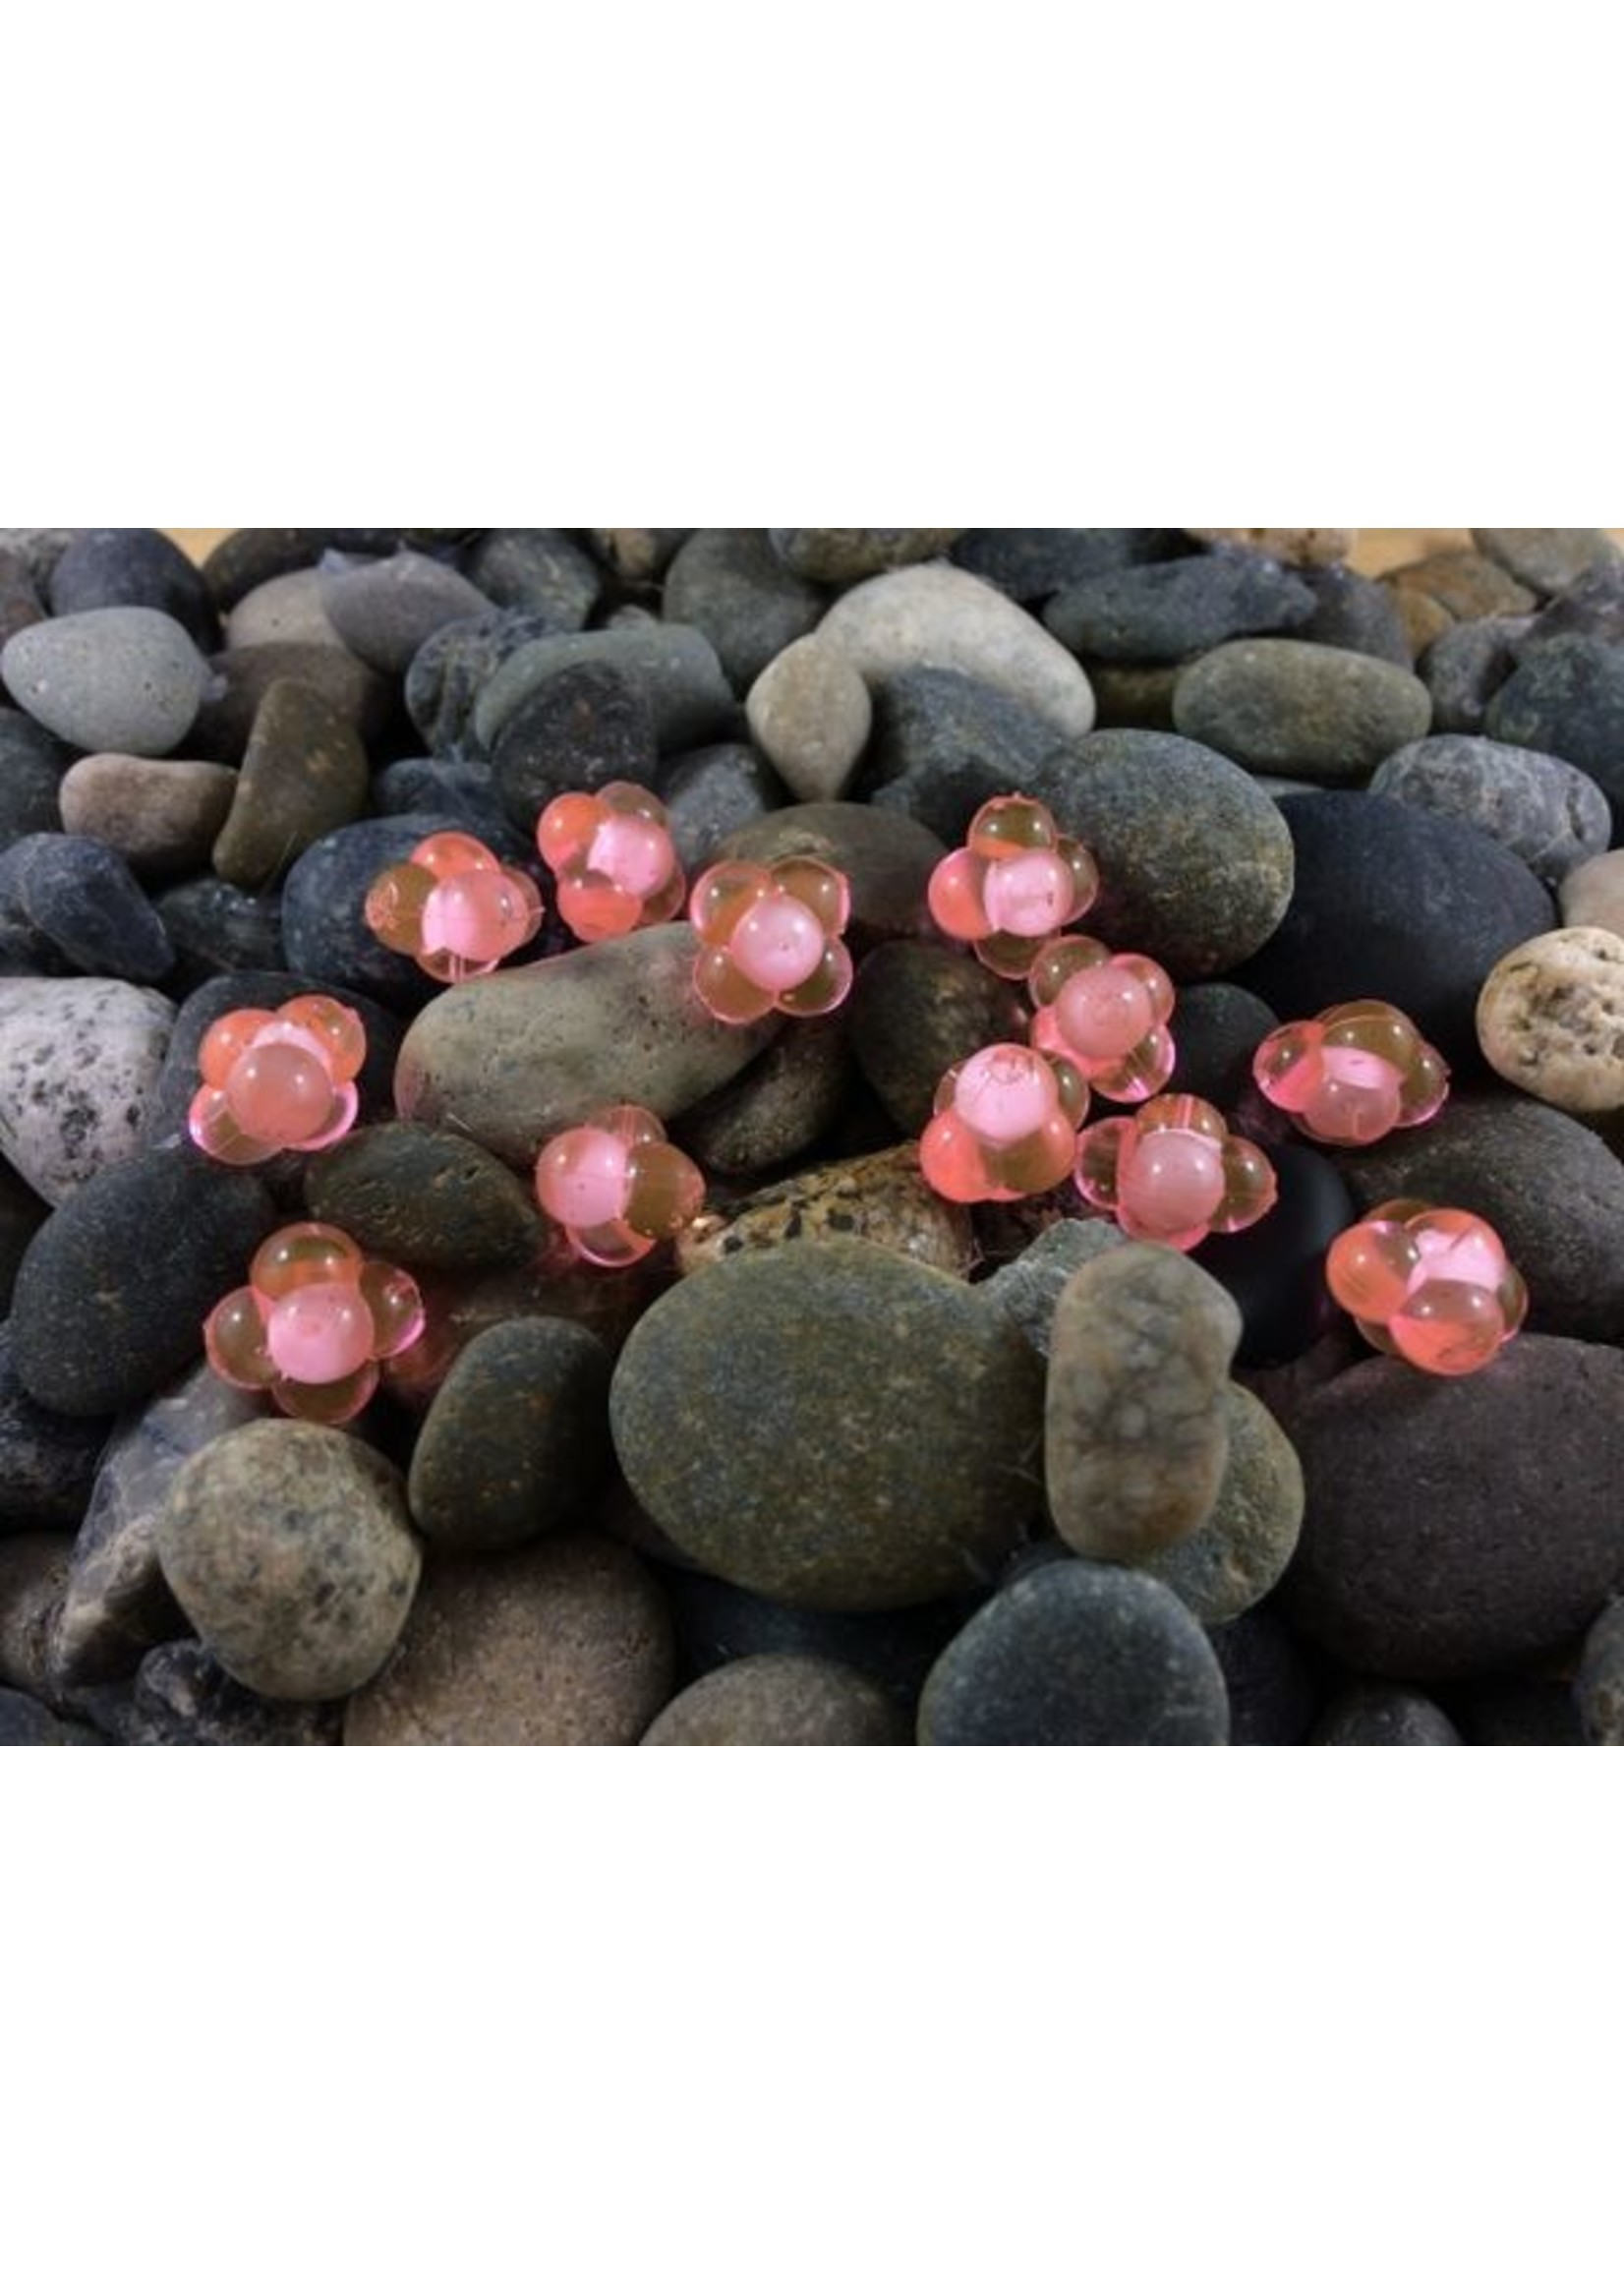 Cleardrift Cleardrift Embryo Egg Clusters Lg Candy Apple w/White Embryo